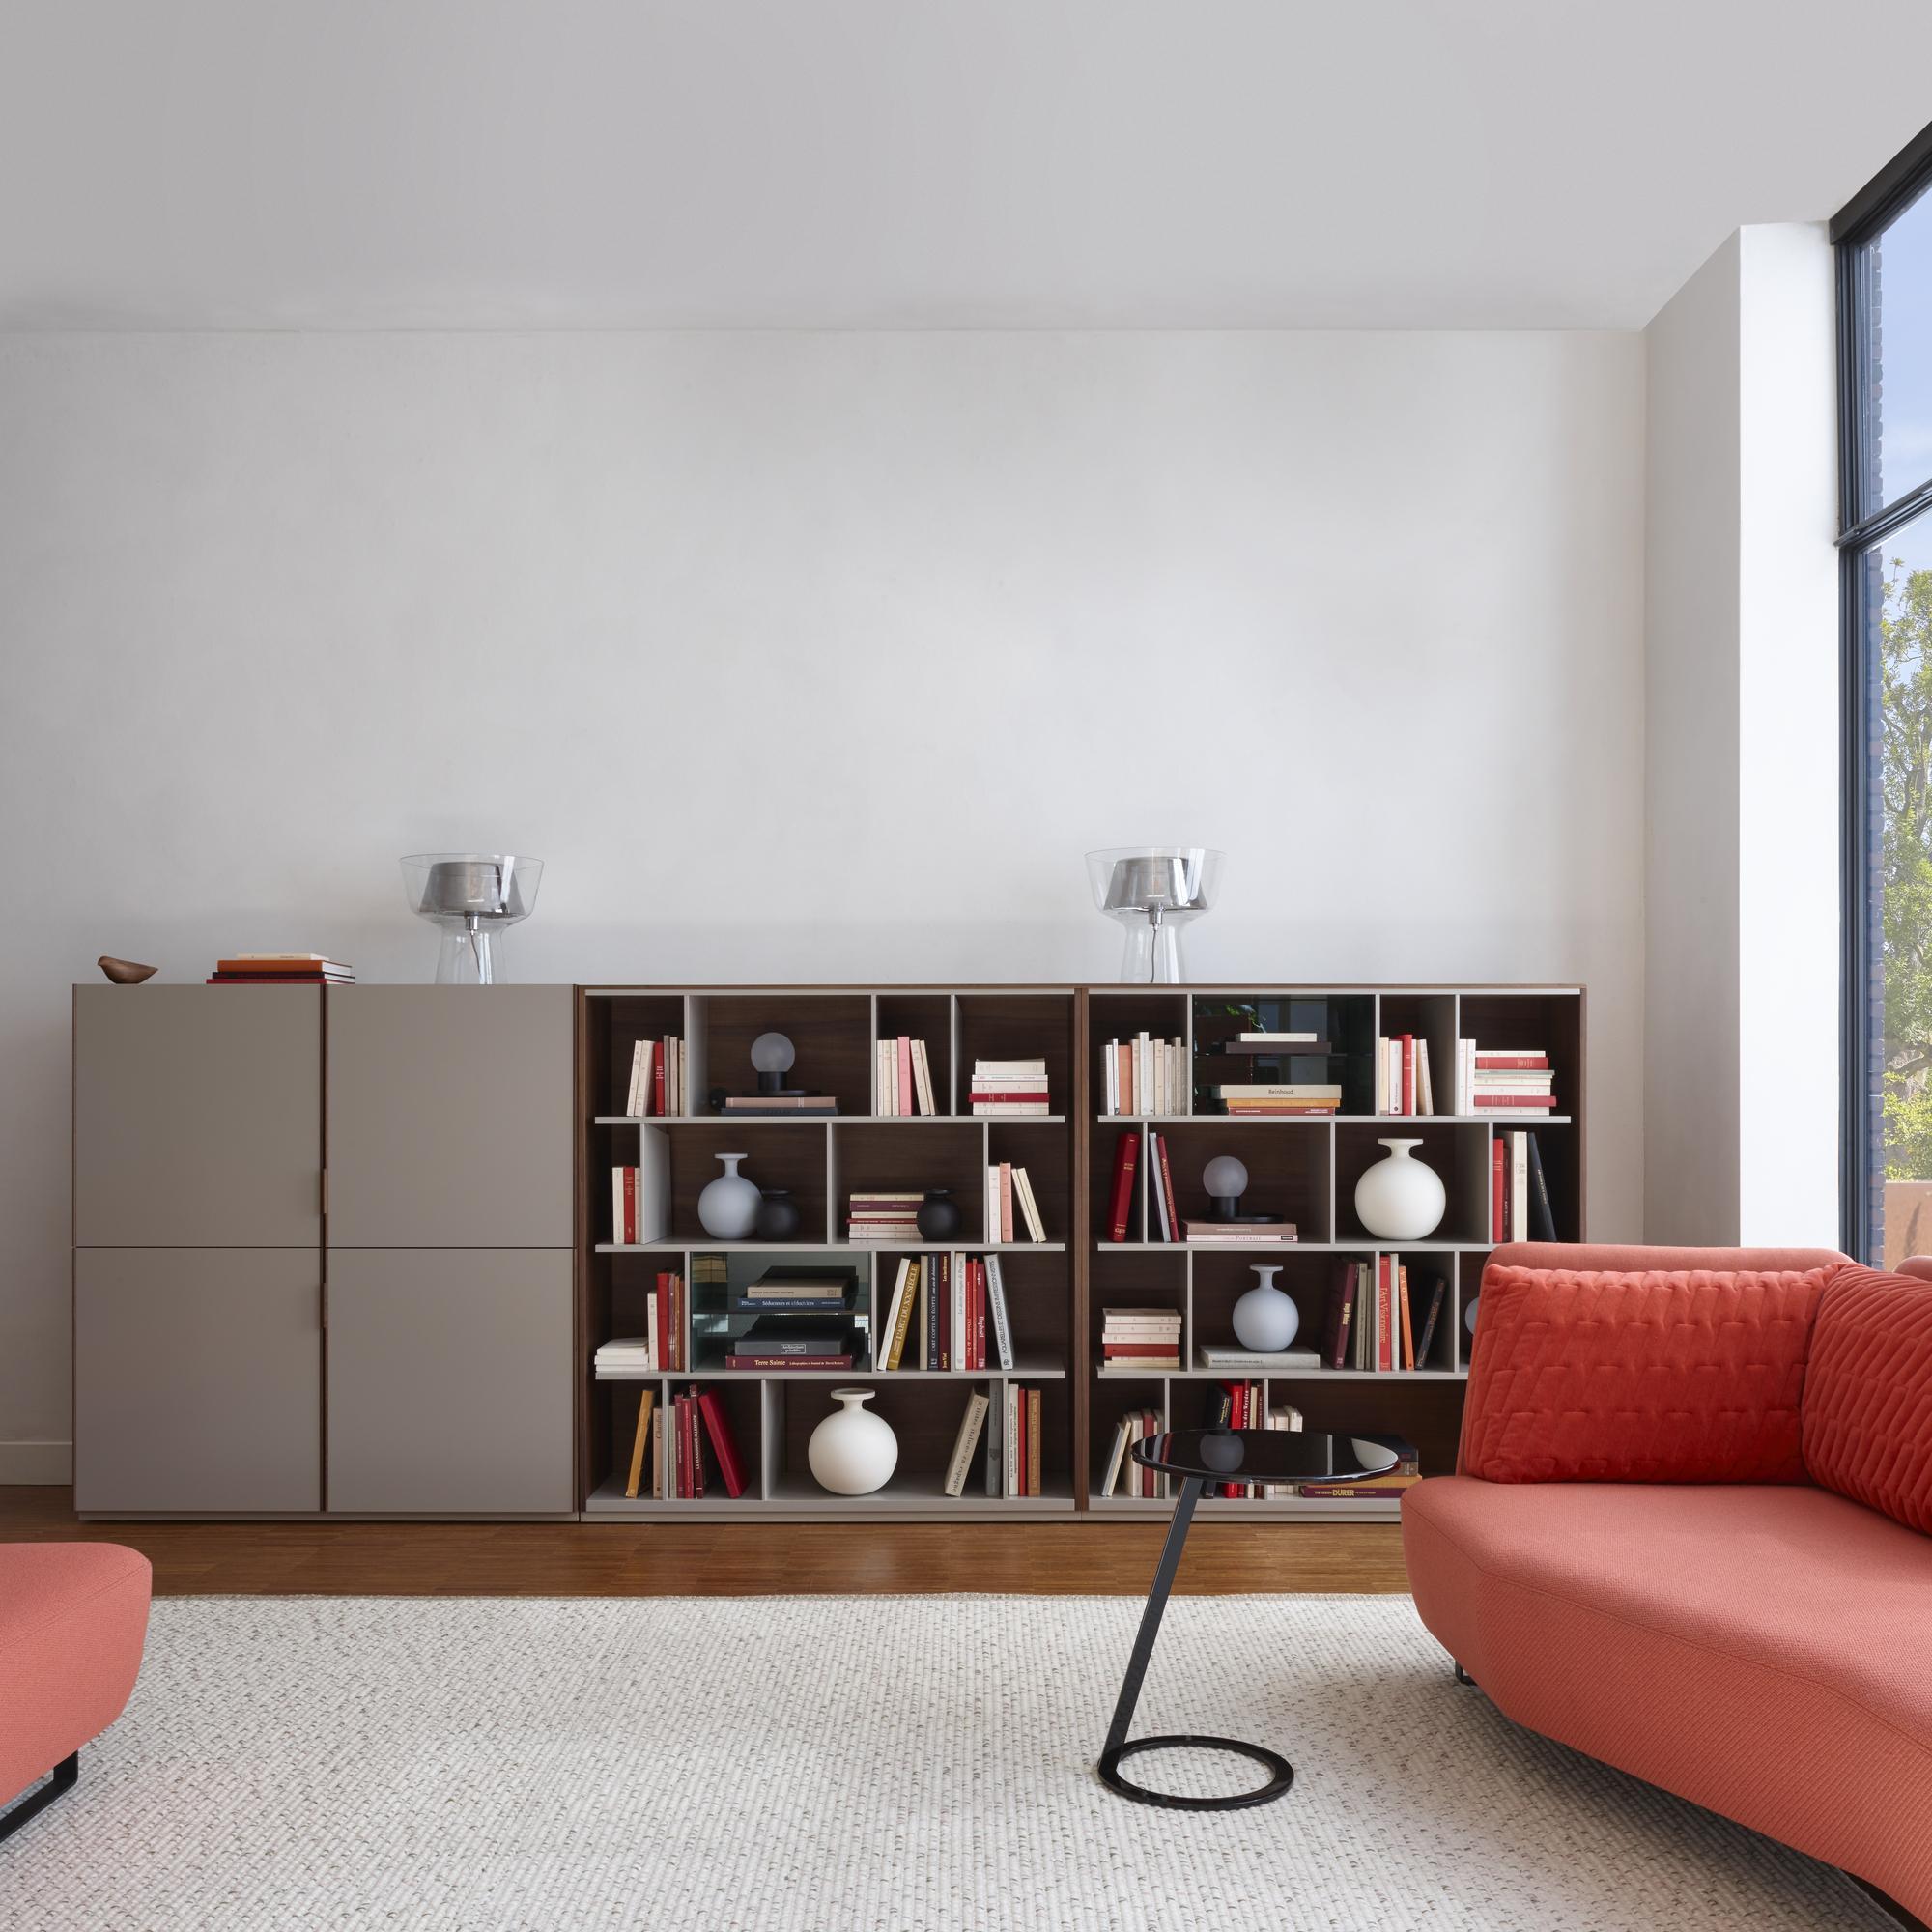 Canaletto Living Room Units From Designer Mauro Lipparini